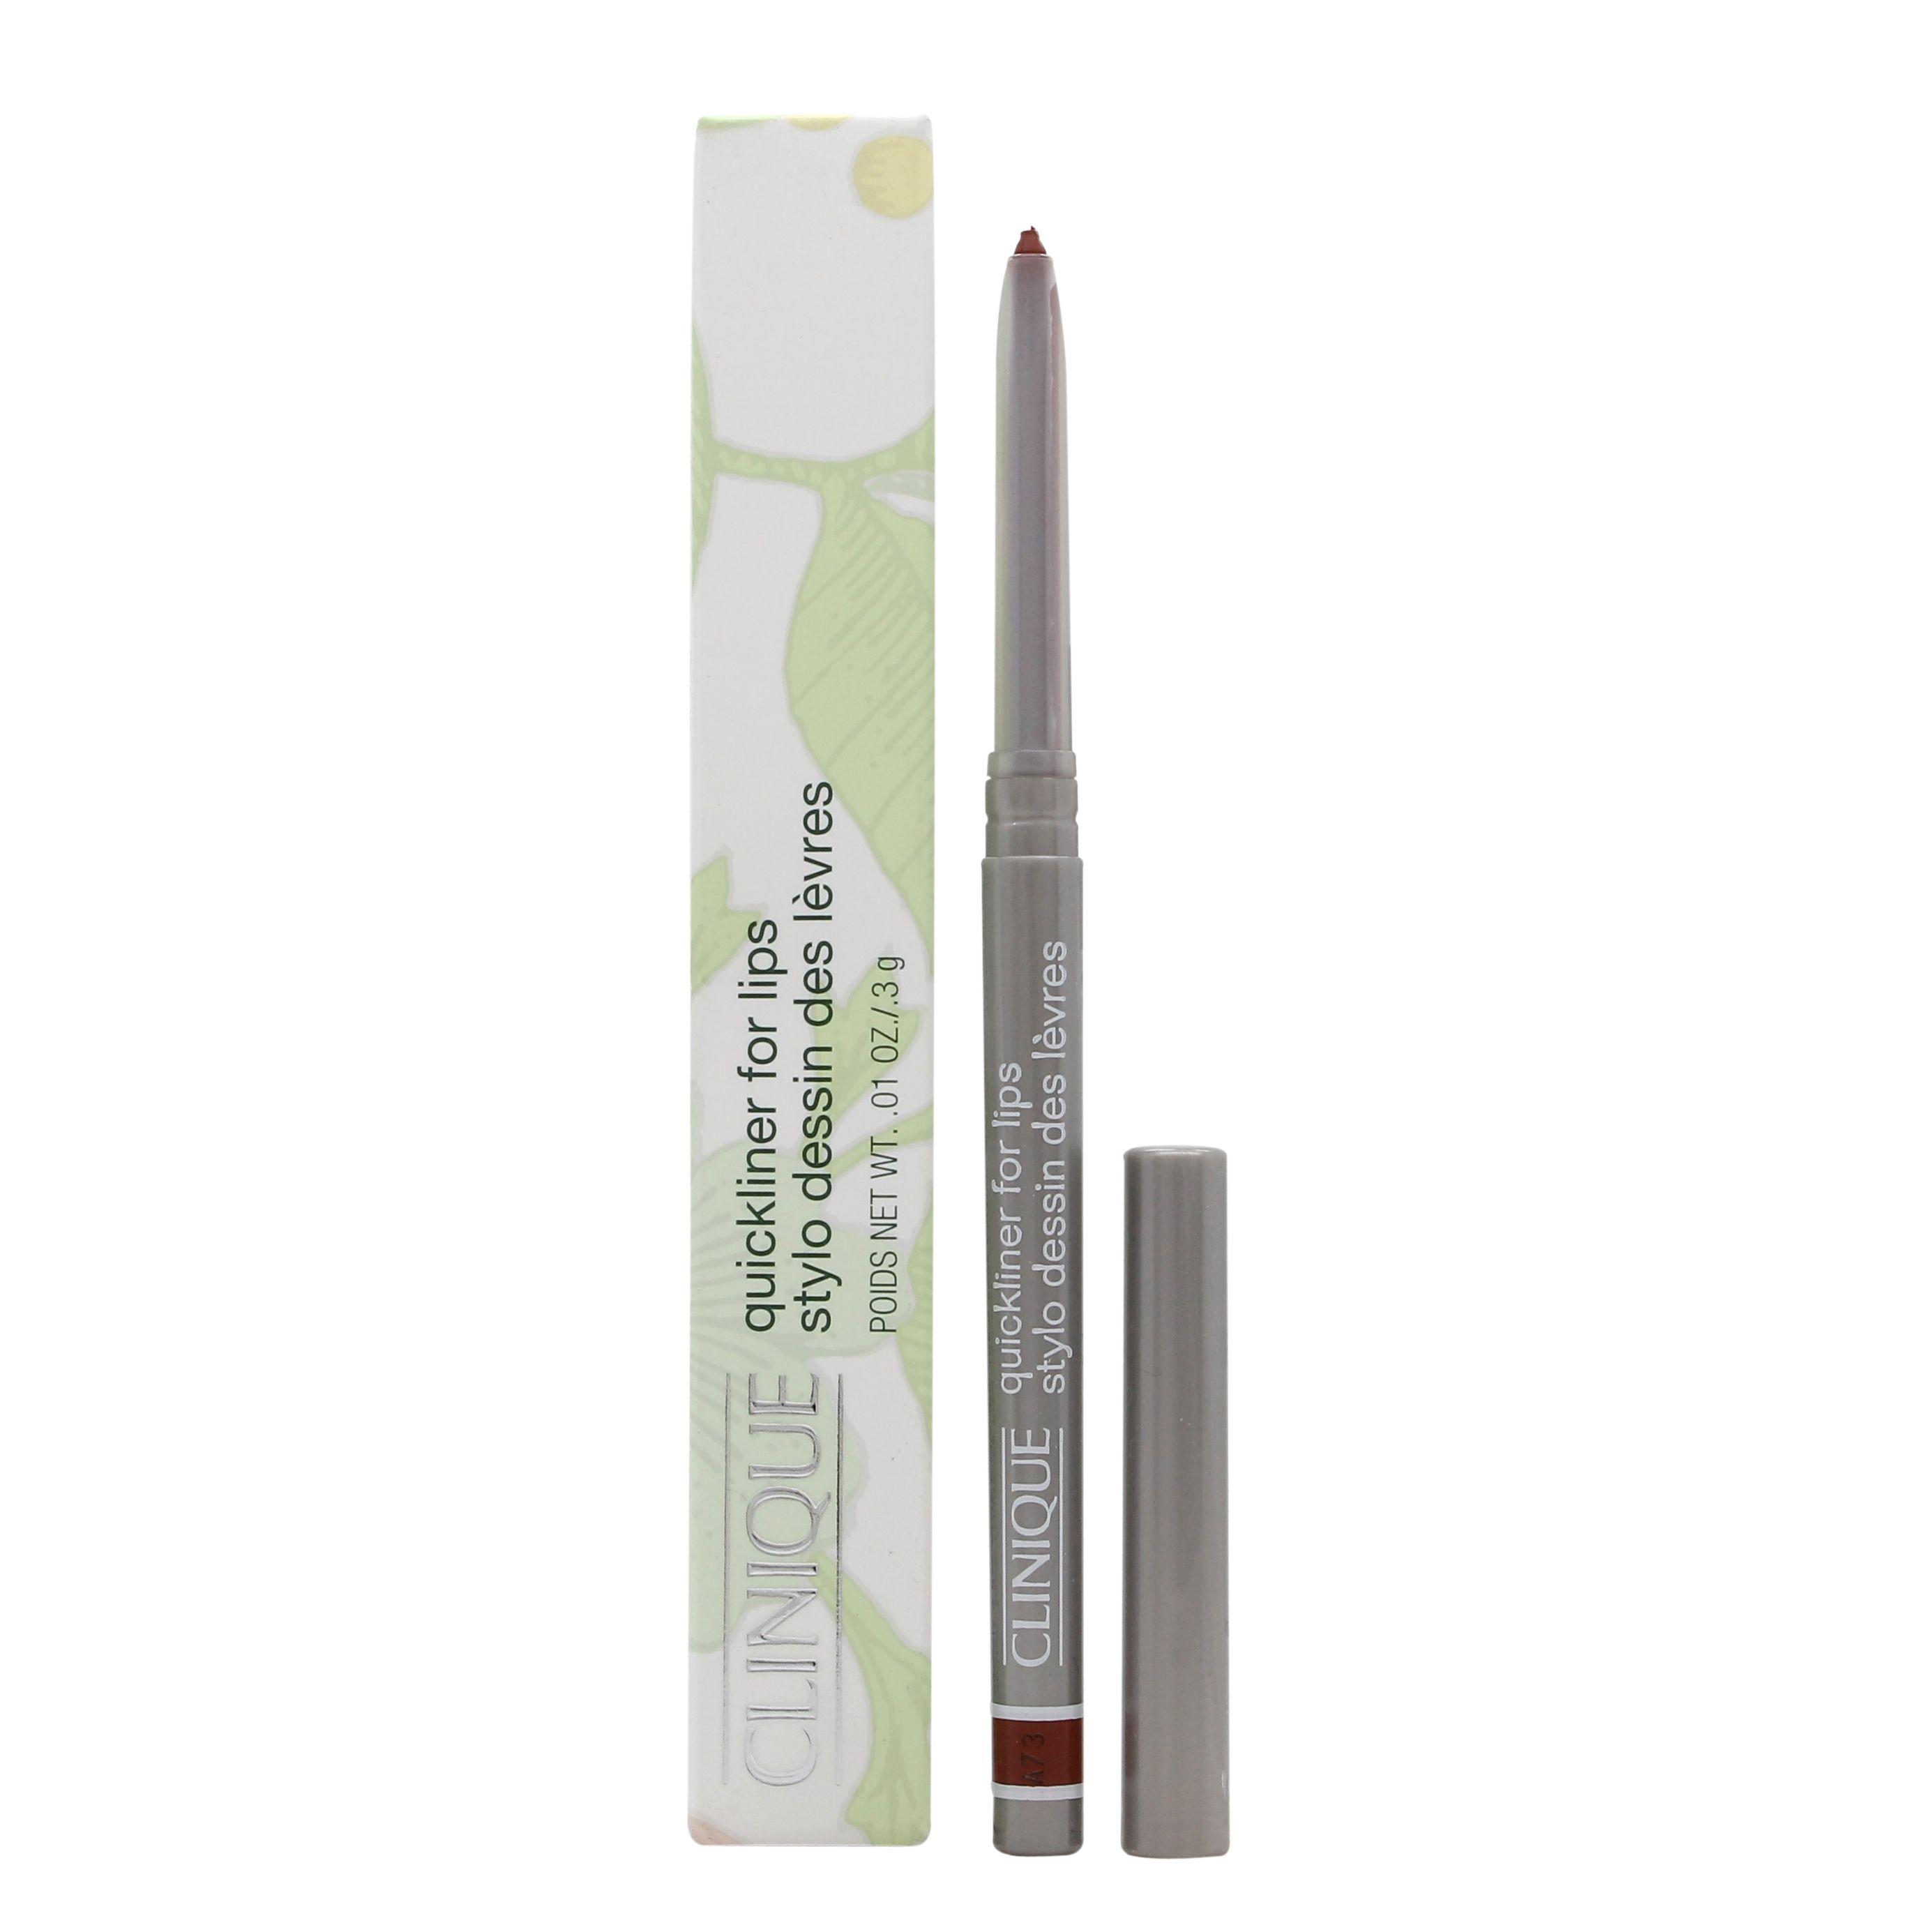 Clinique Quickliner for Lips Matita Labbra Tonalit 09 Honeystick